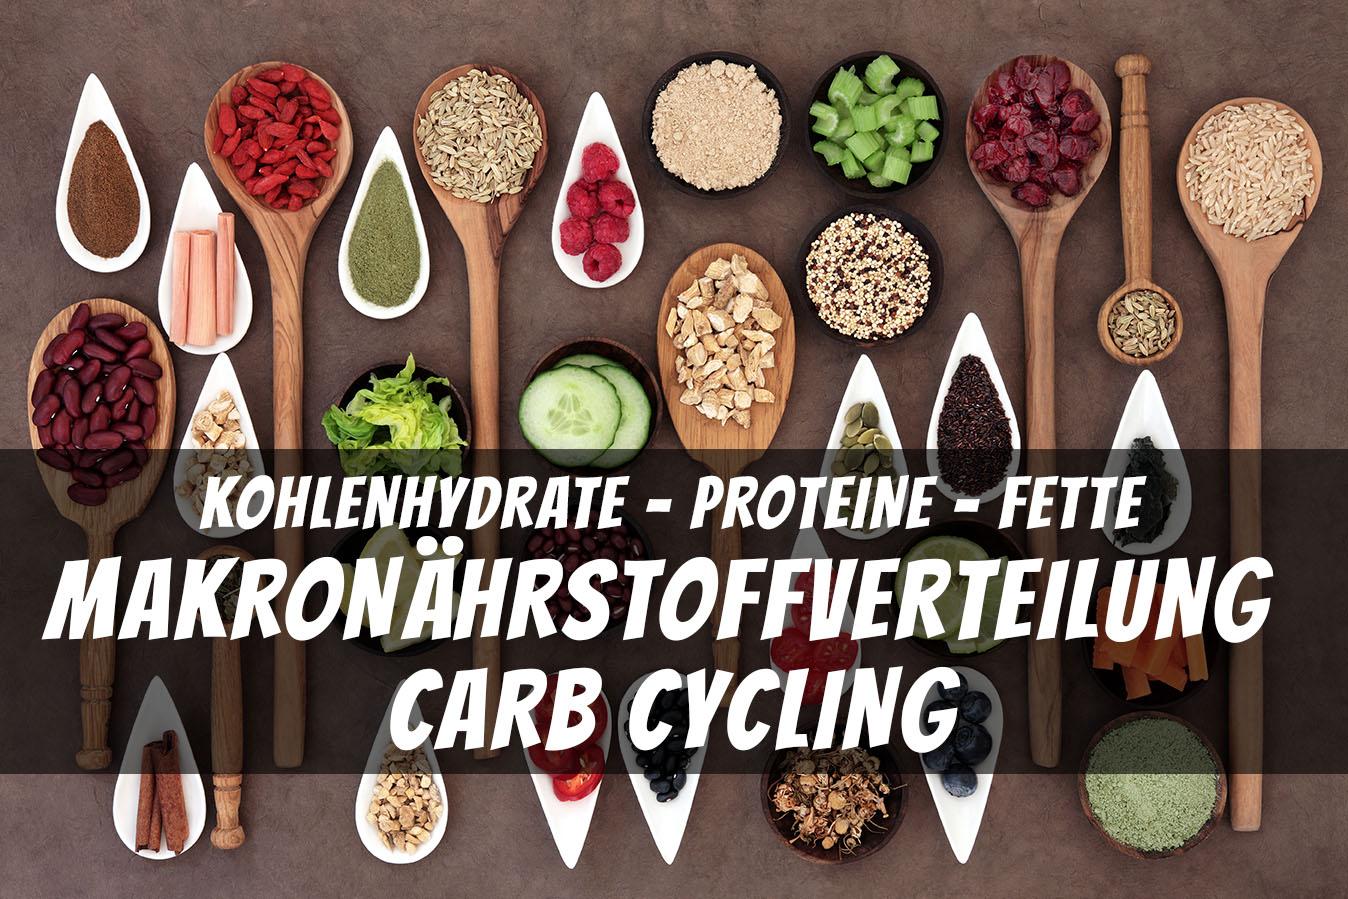 Kohlenhydrate Proteine Fette die richtige Makronährstoffverteilung bei Carb Cycling